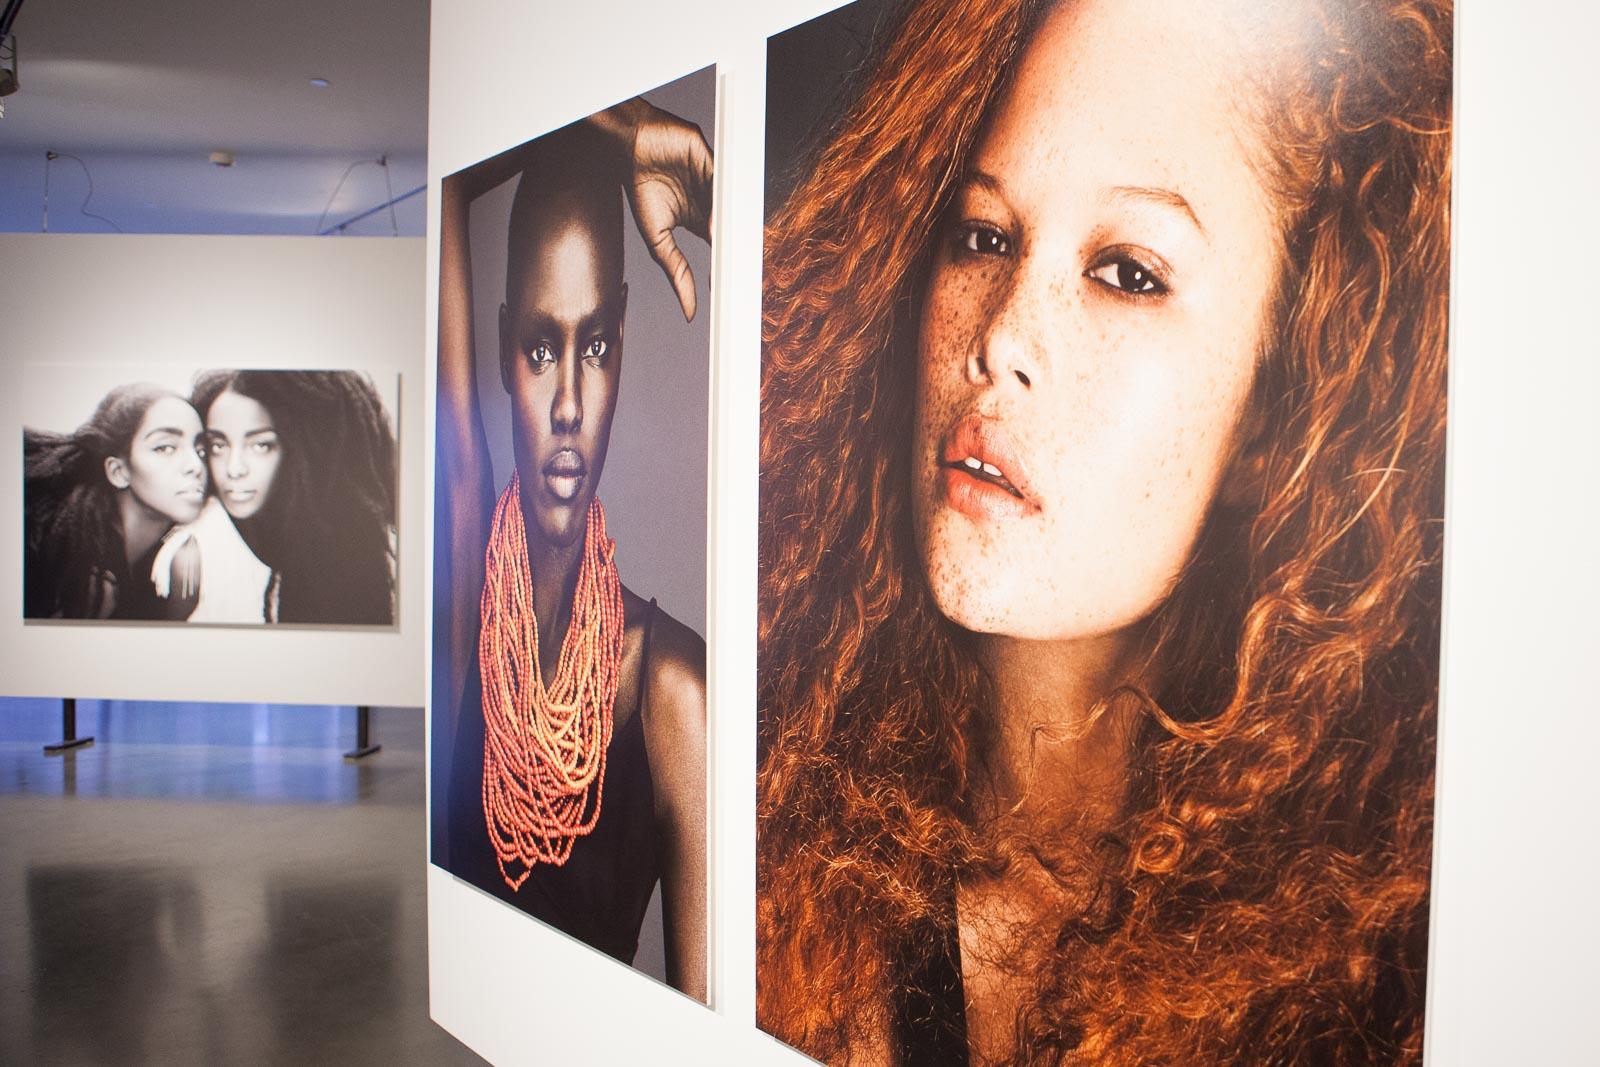 alexi-lubomirski-diverse-beauty-exhibition-robertiaga-12